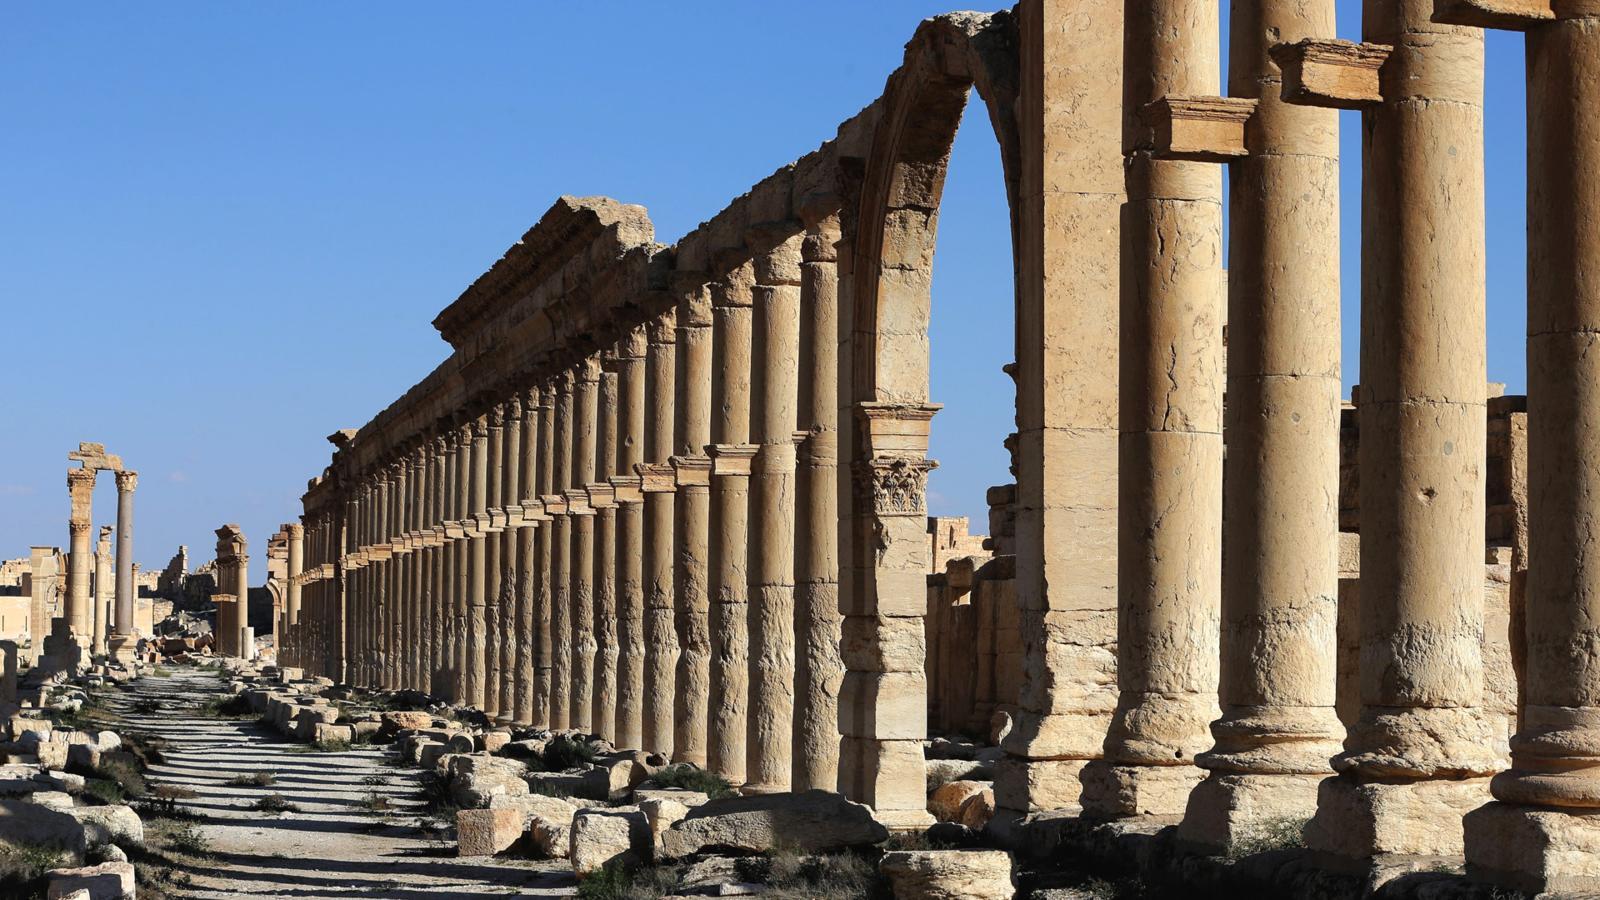 005 - SYRIA-CONFLICT-HERITAGE-PALMYRA